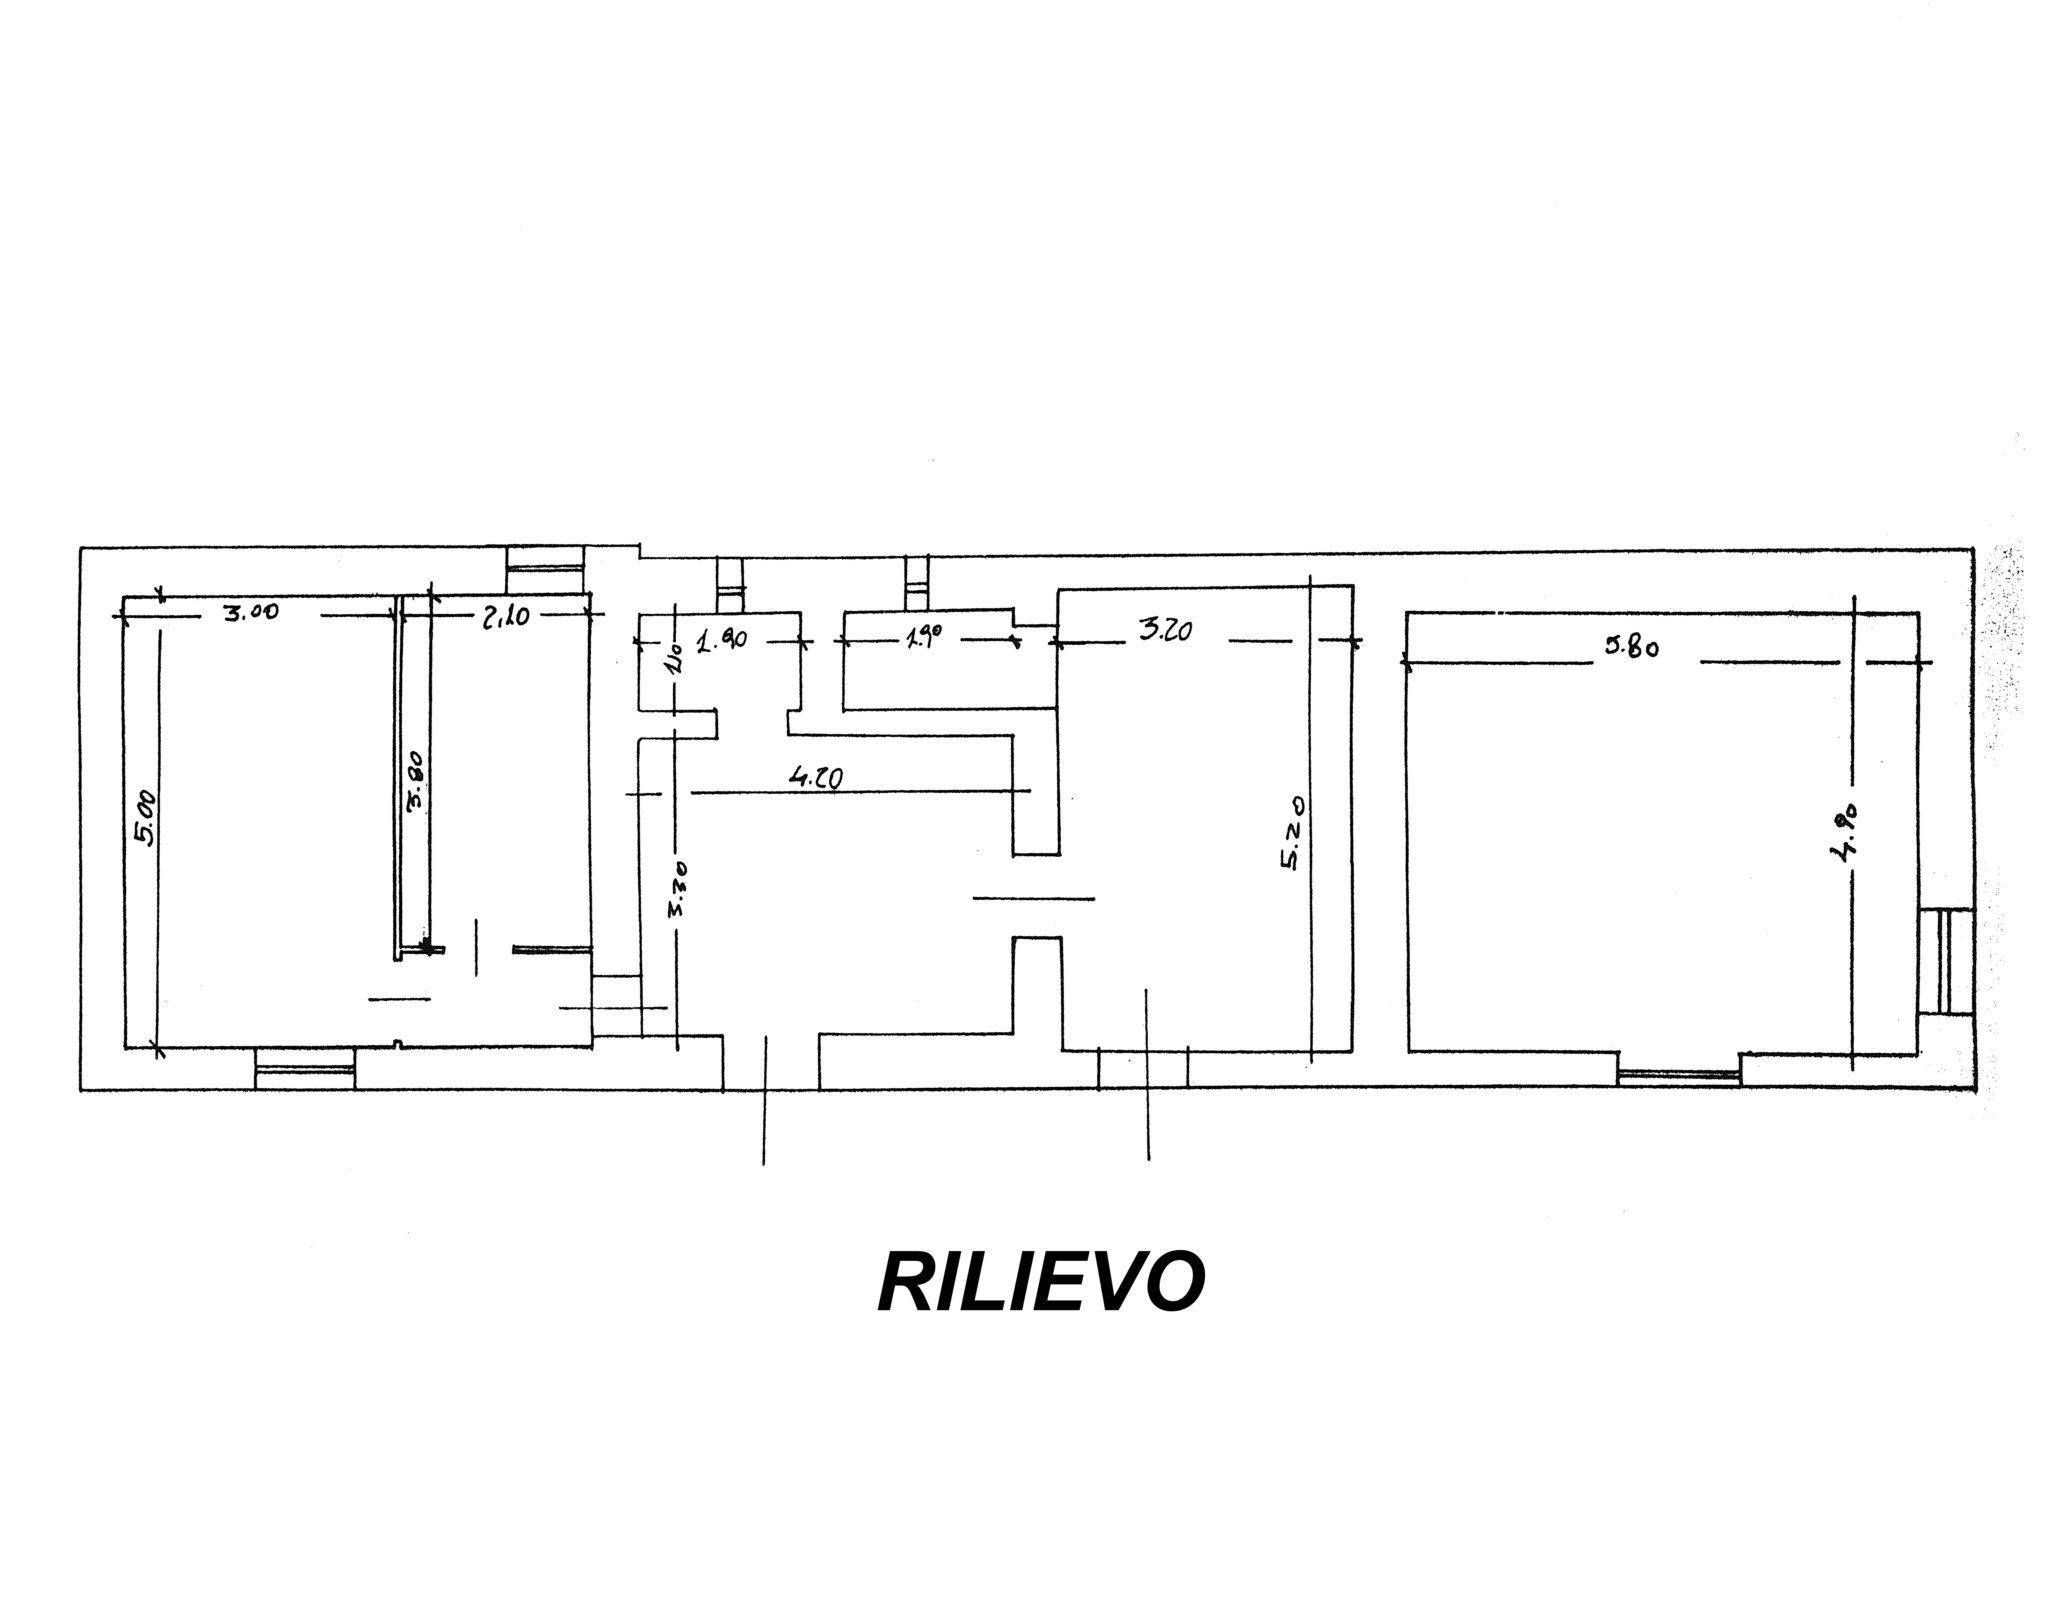 Vendita villa – Contrada Pisciacalze, Ceglie Messapica (Brindisi)